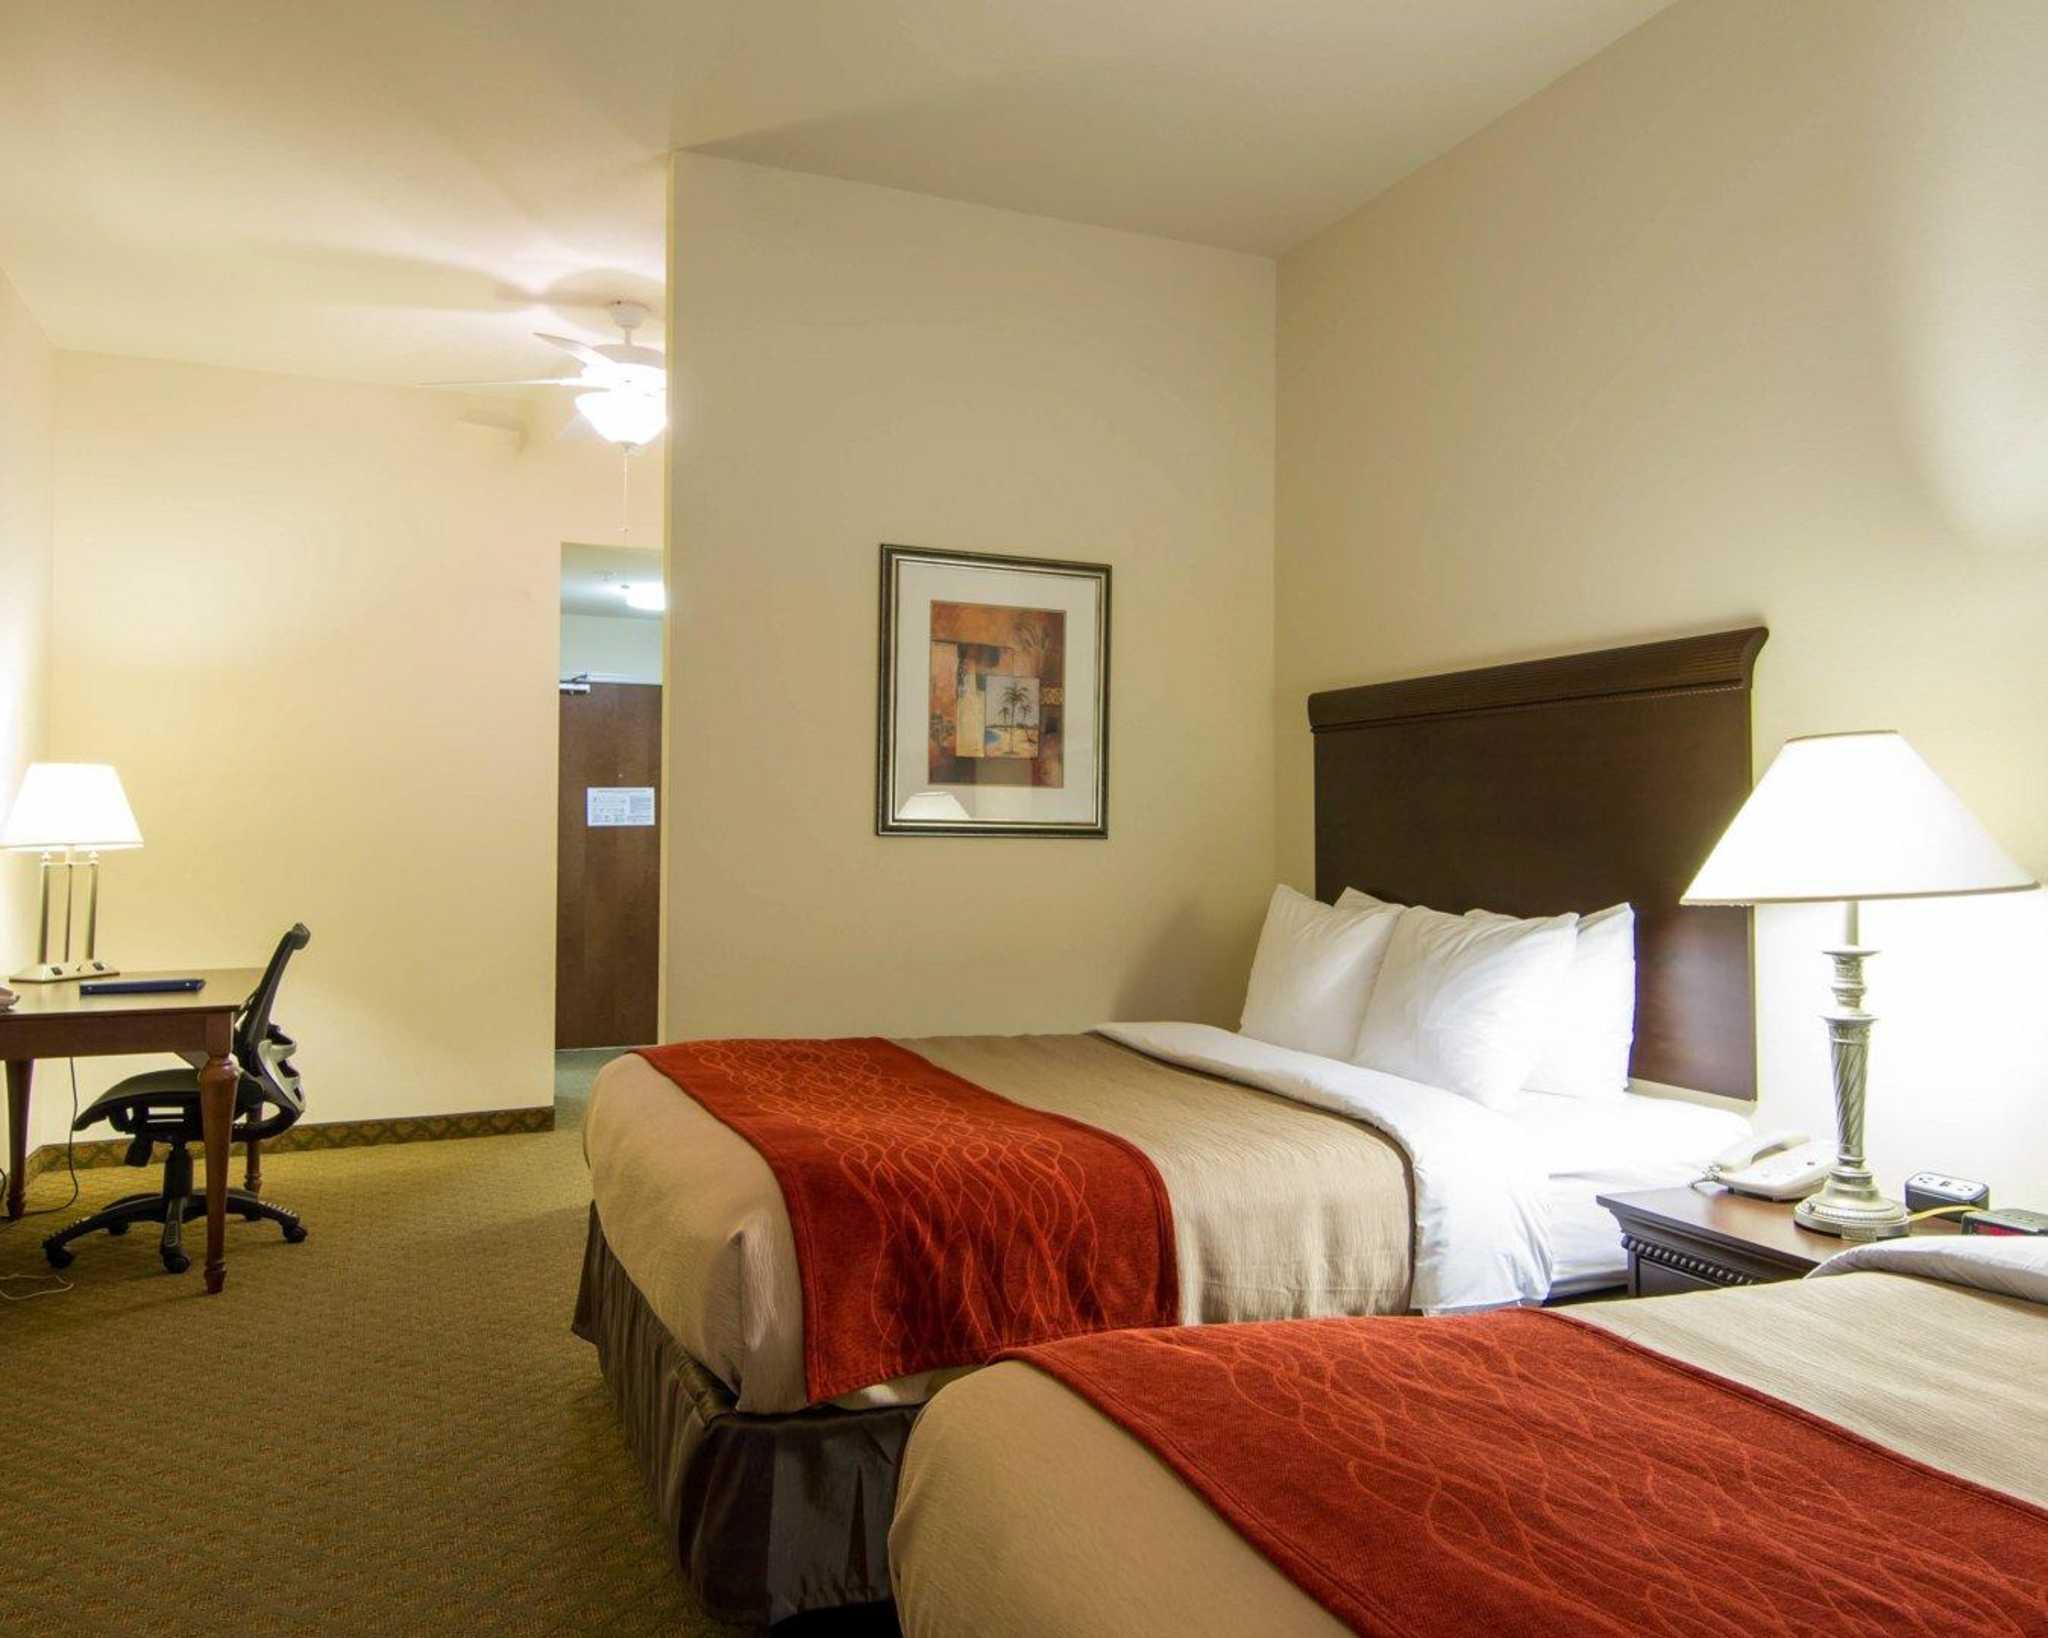 Comfort Inn & Suites Airport image 24